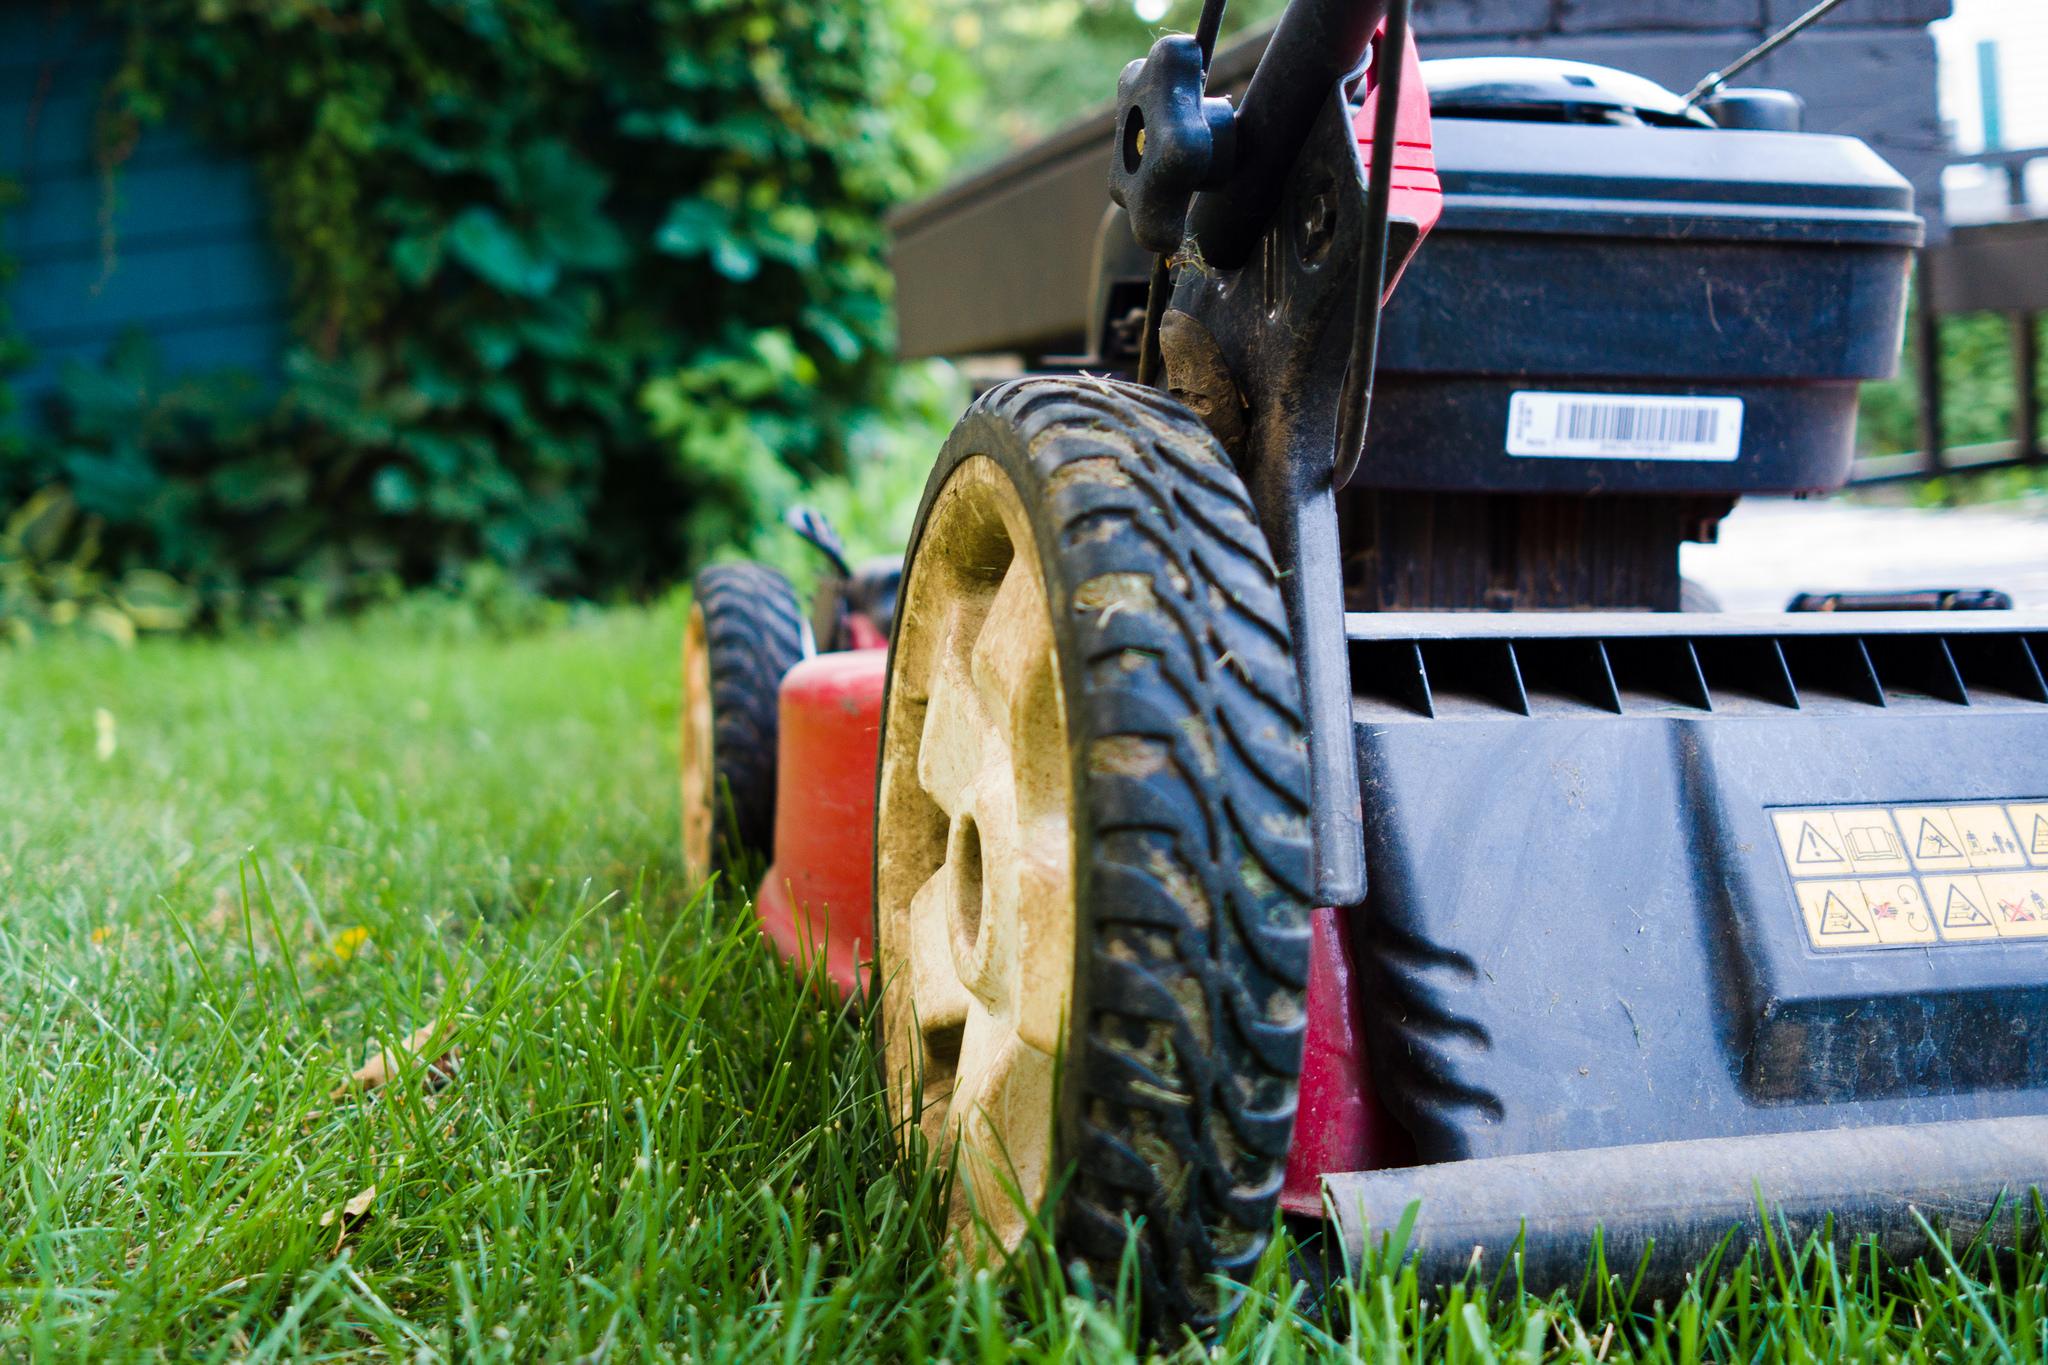 lawn mower back